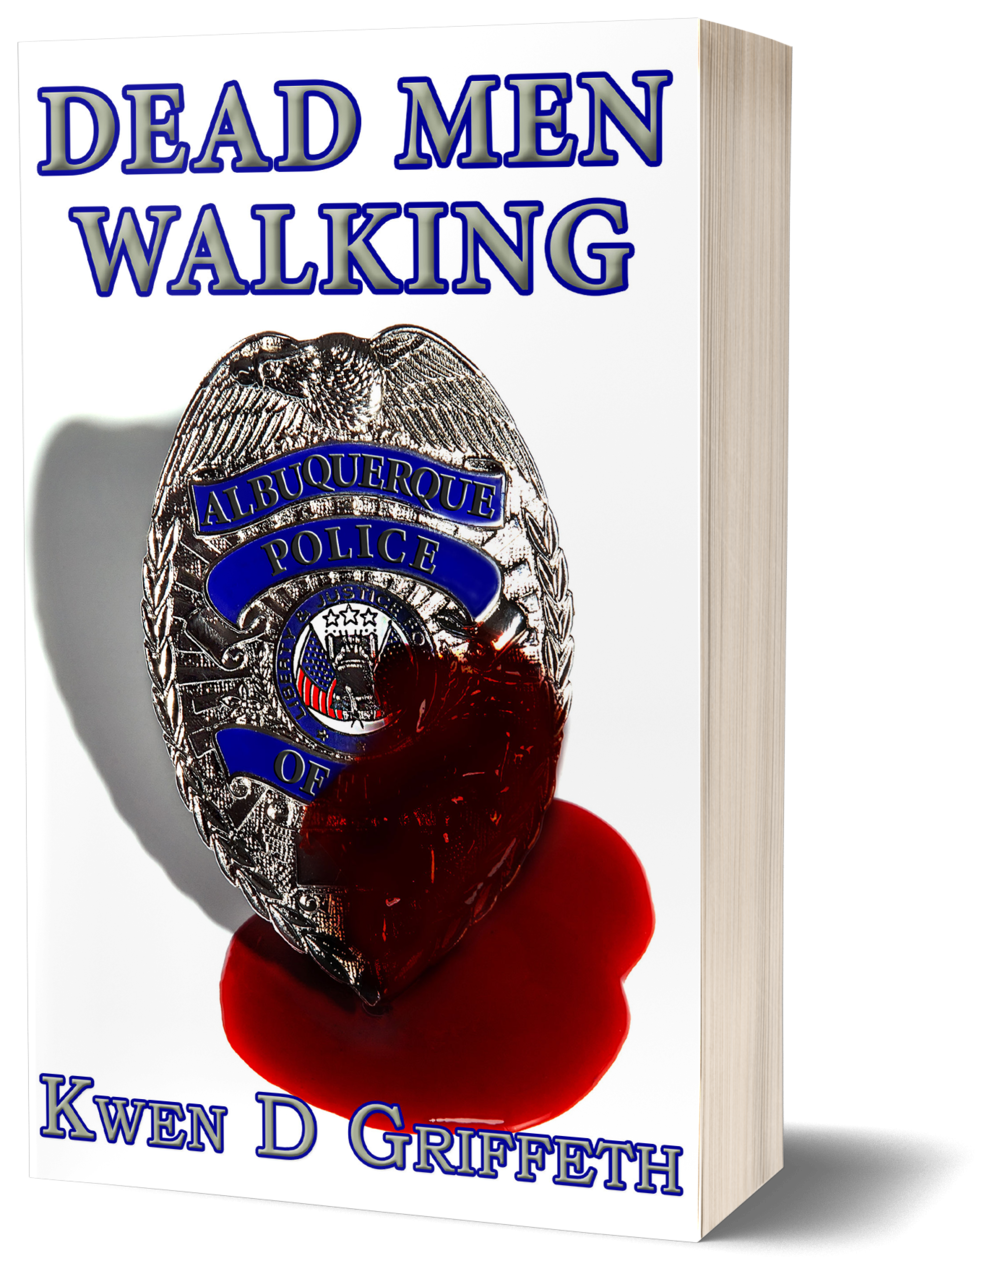 dead men walking book mockup.png